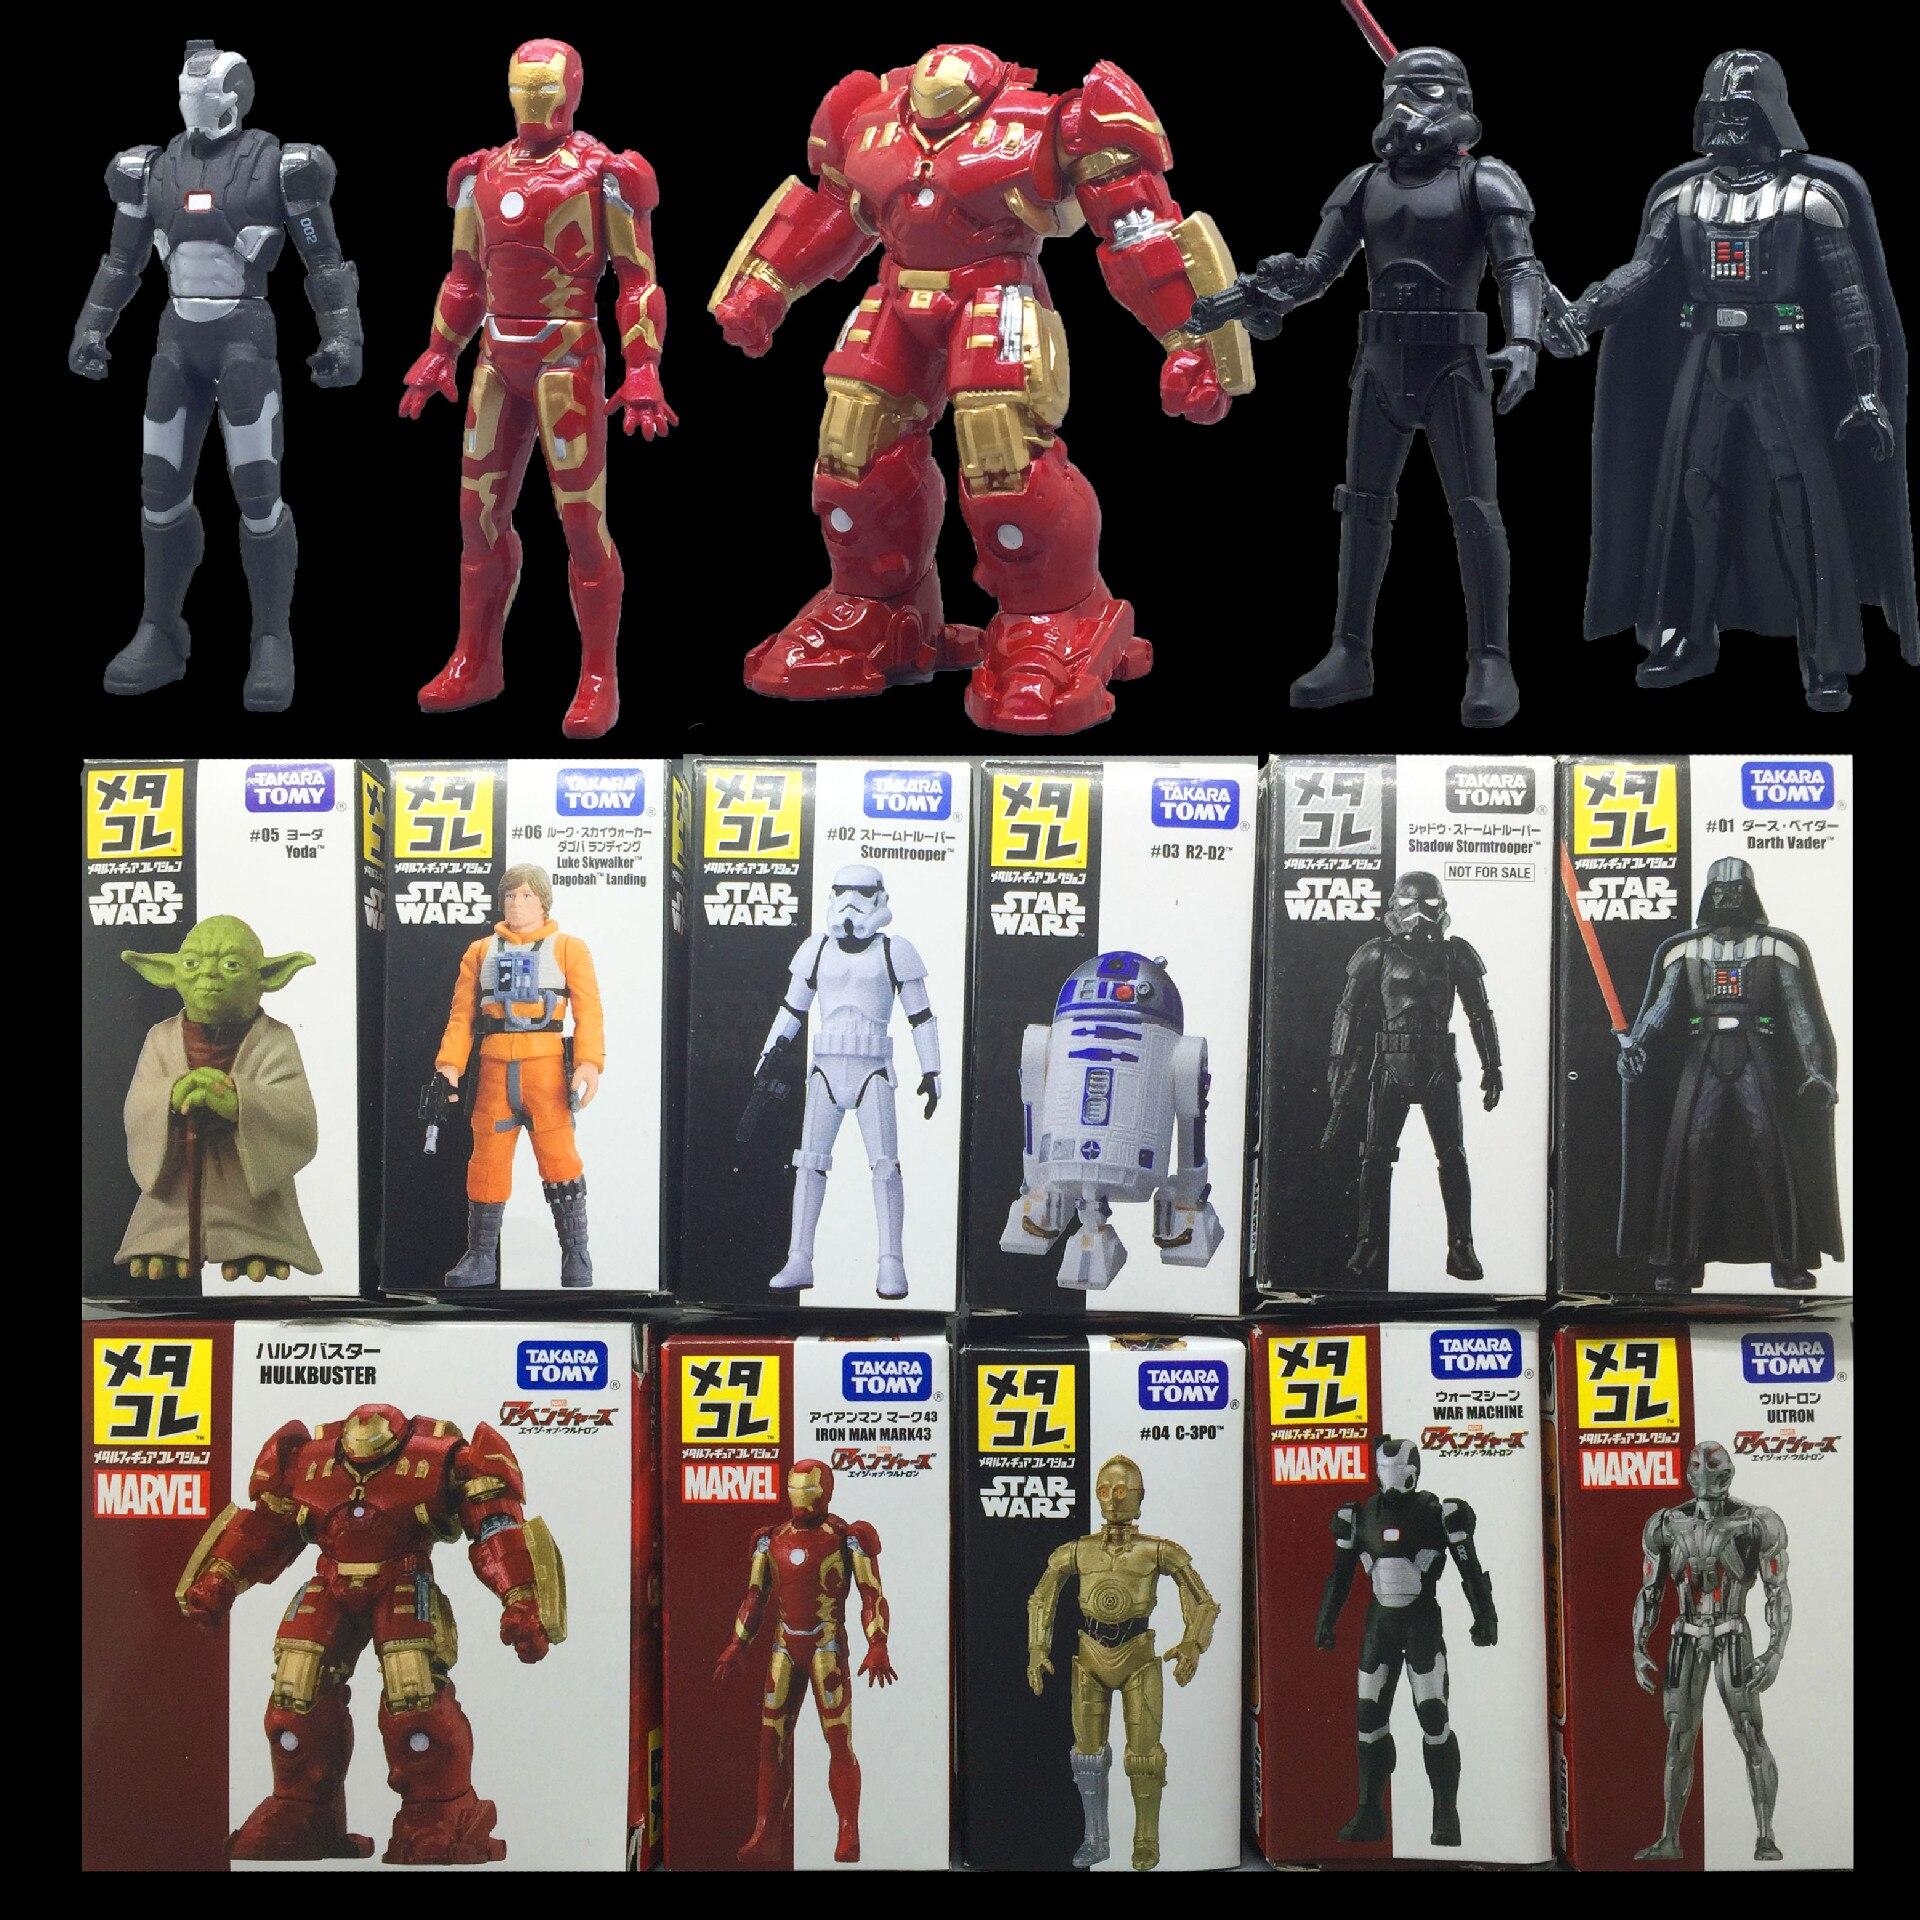 Takara TOMY Original Star Wars Iron Man Anti Hulk Armor Black Samurai Yoda Skywalker Alloy Action Figure Model Kids Toy Gift(China)